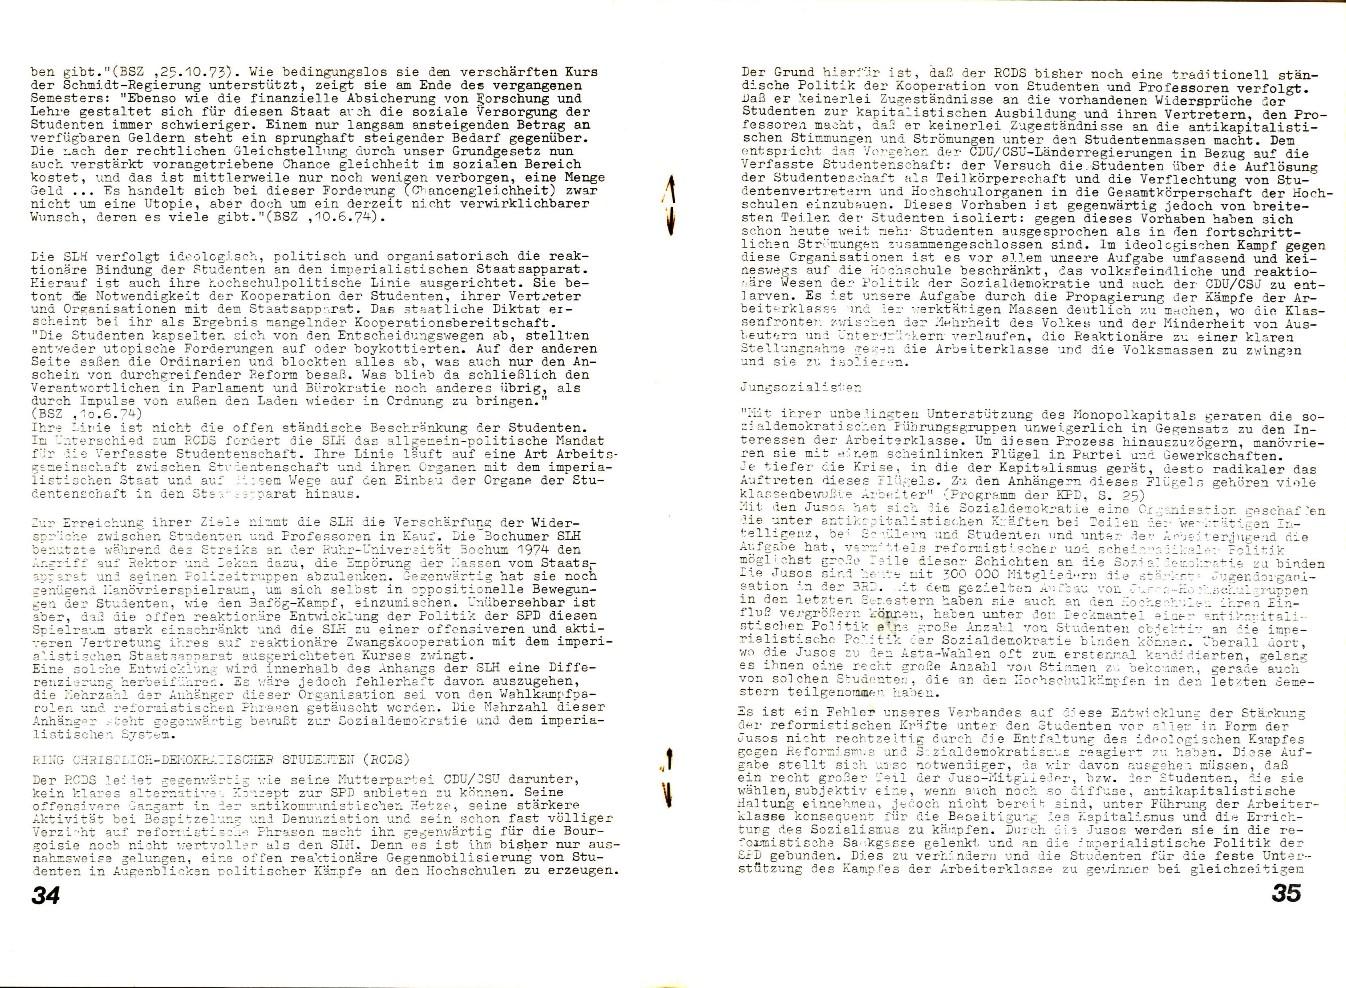 KSV_1974_Rechenschaftsbericht_19